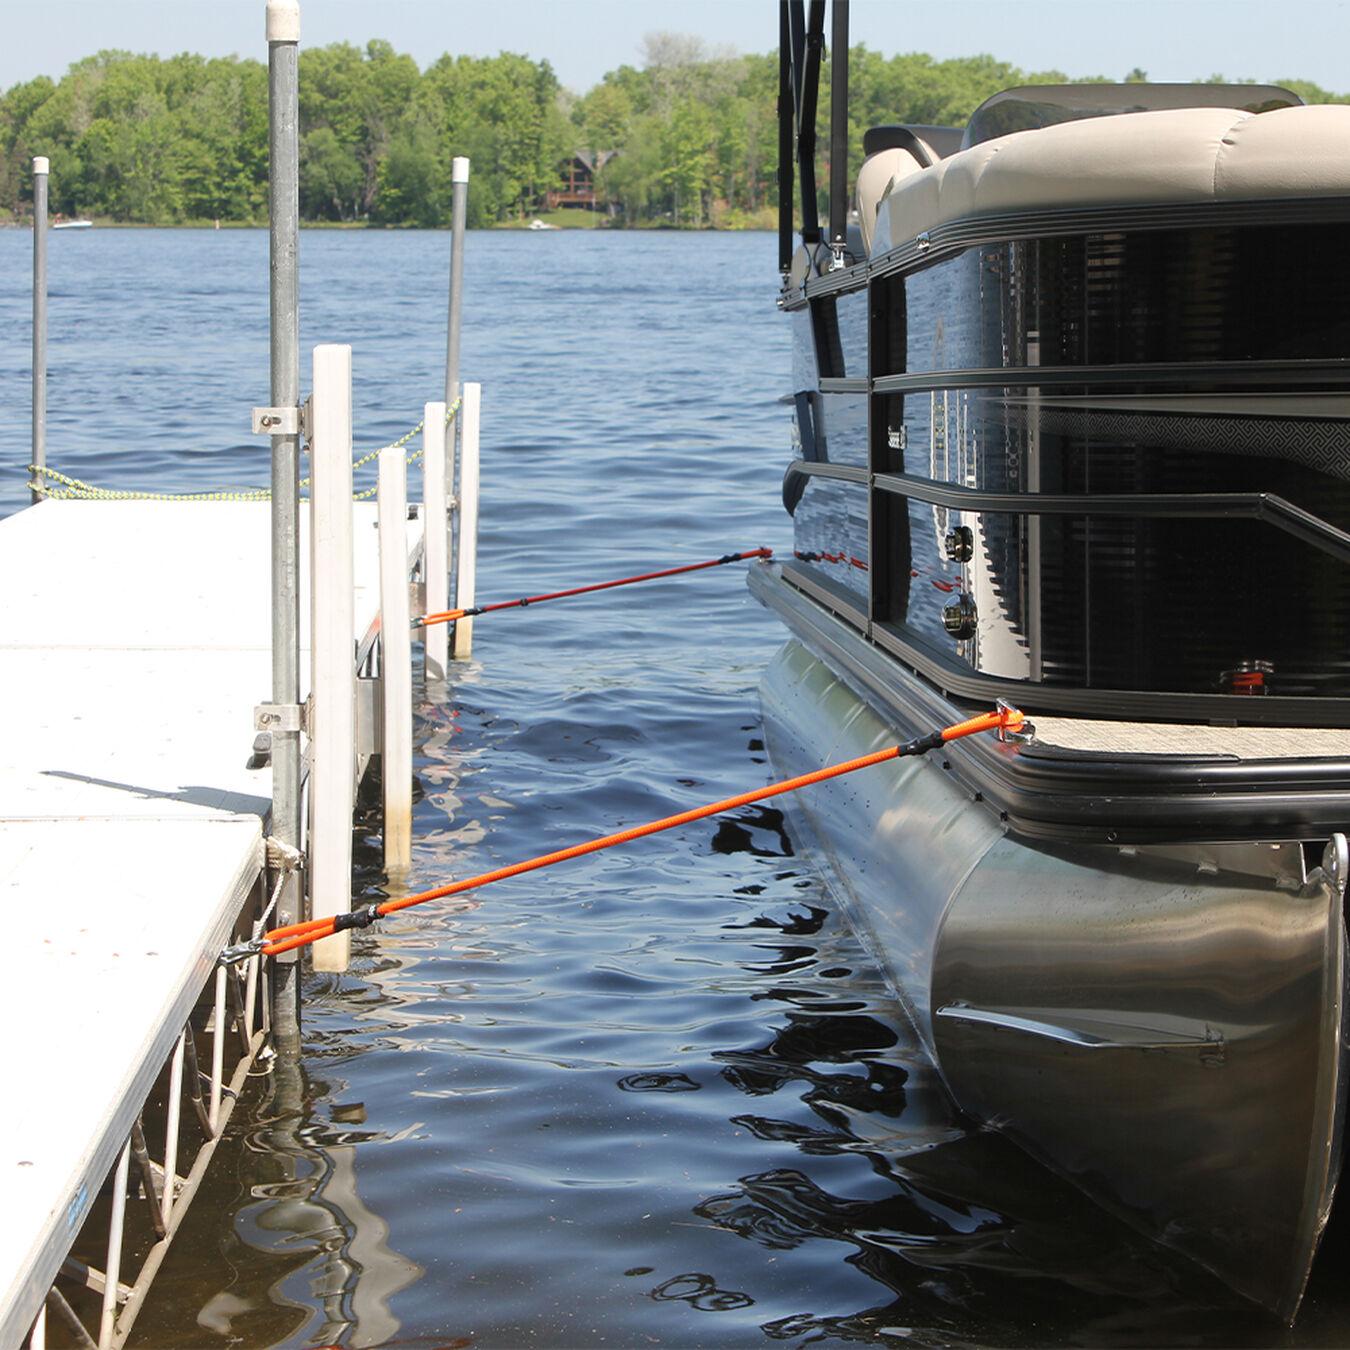 Anchor Shock Dock Shock Mooring Shock Absorber Kit Contains 2 Shocks